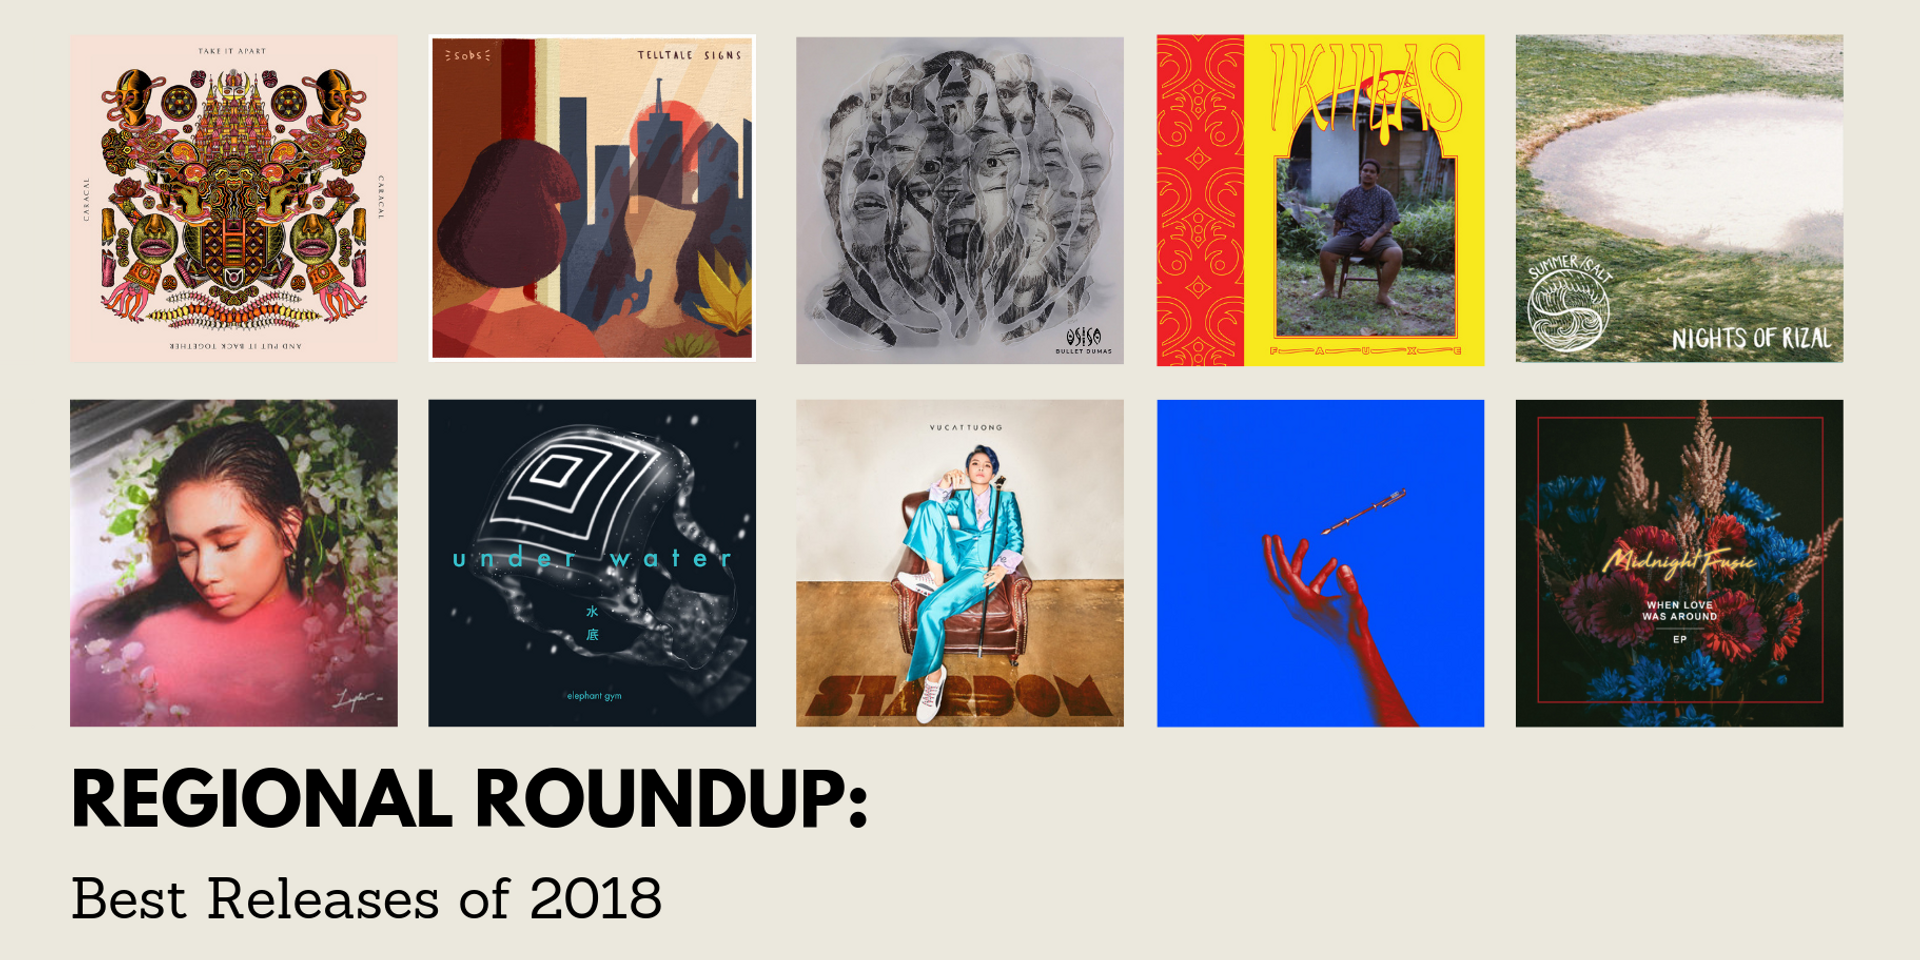 Regional Roundup: Best Releases of 2018